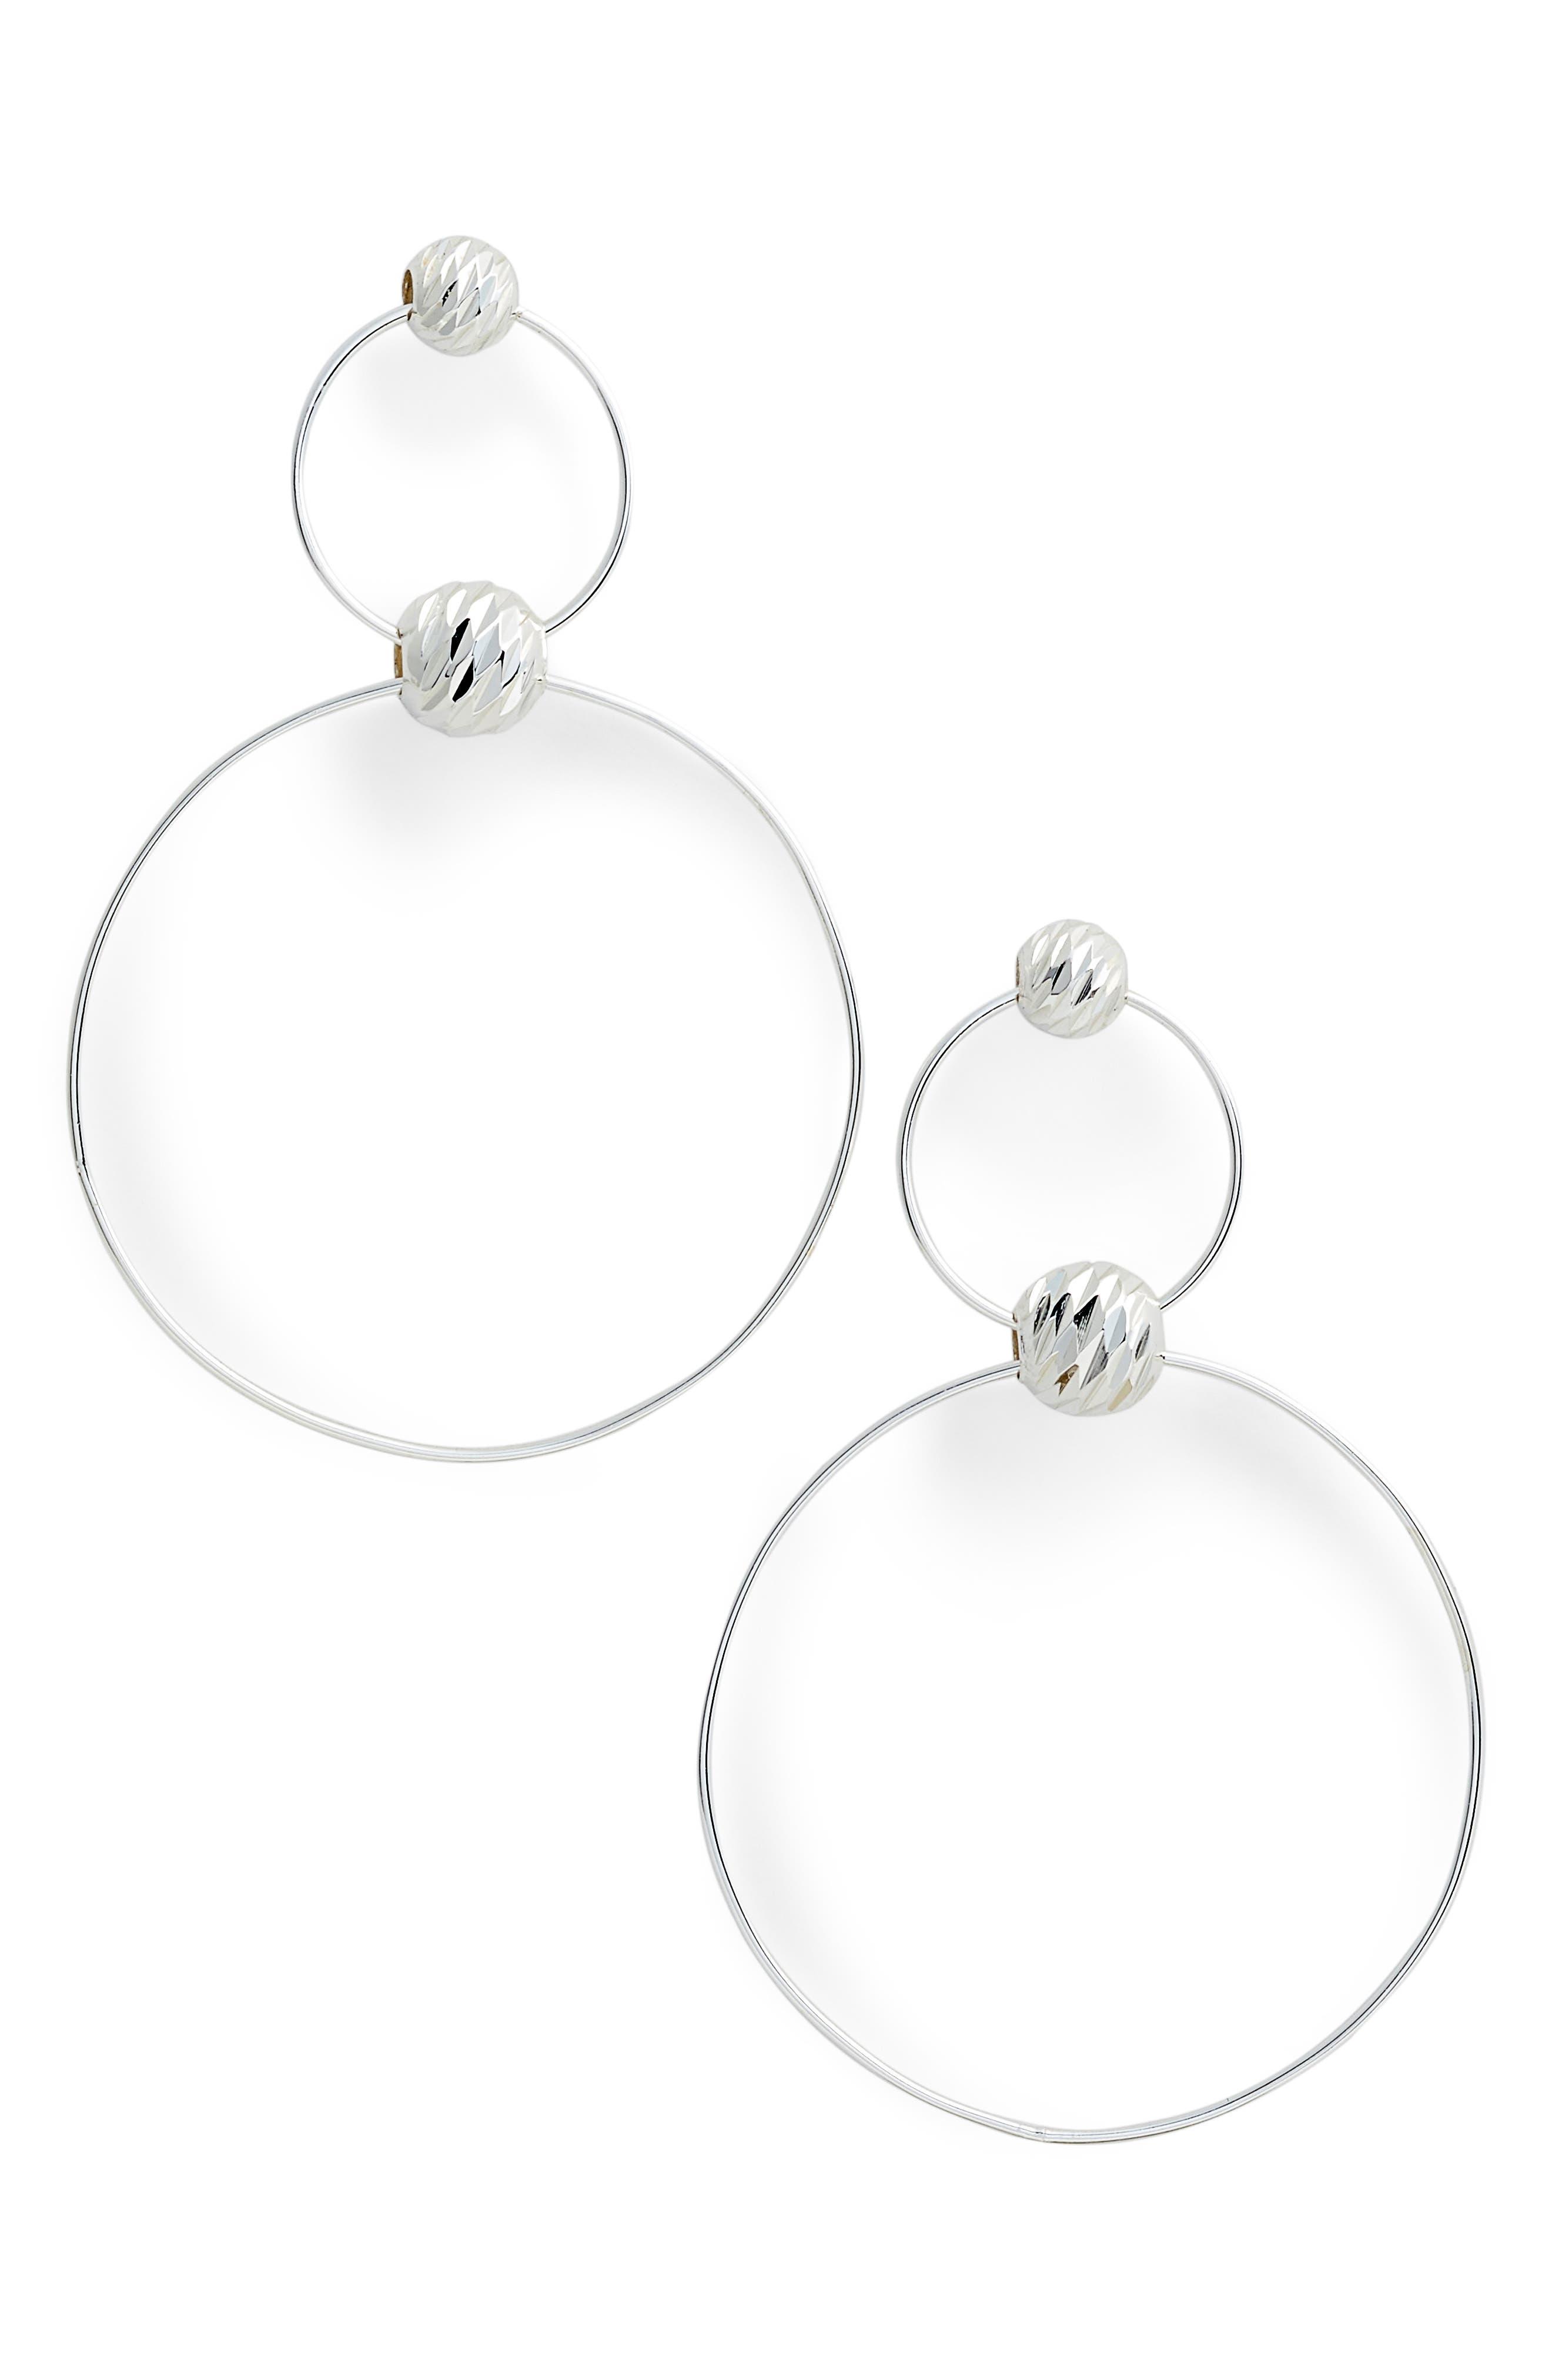 Alternate Image 1 Selected - Argento Vivo Double Drop Earrings